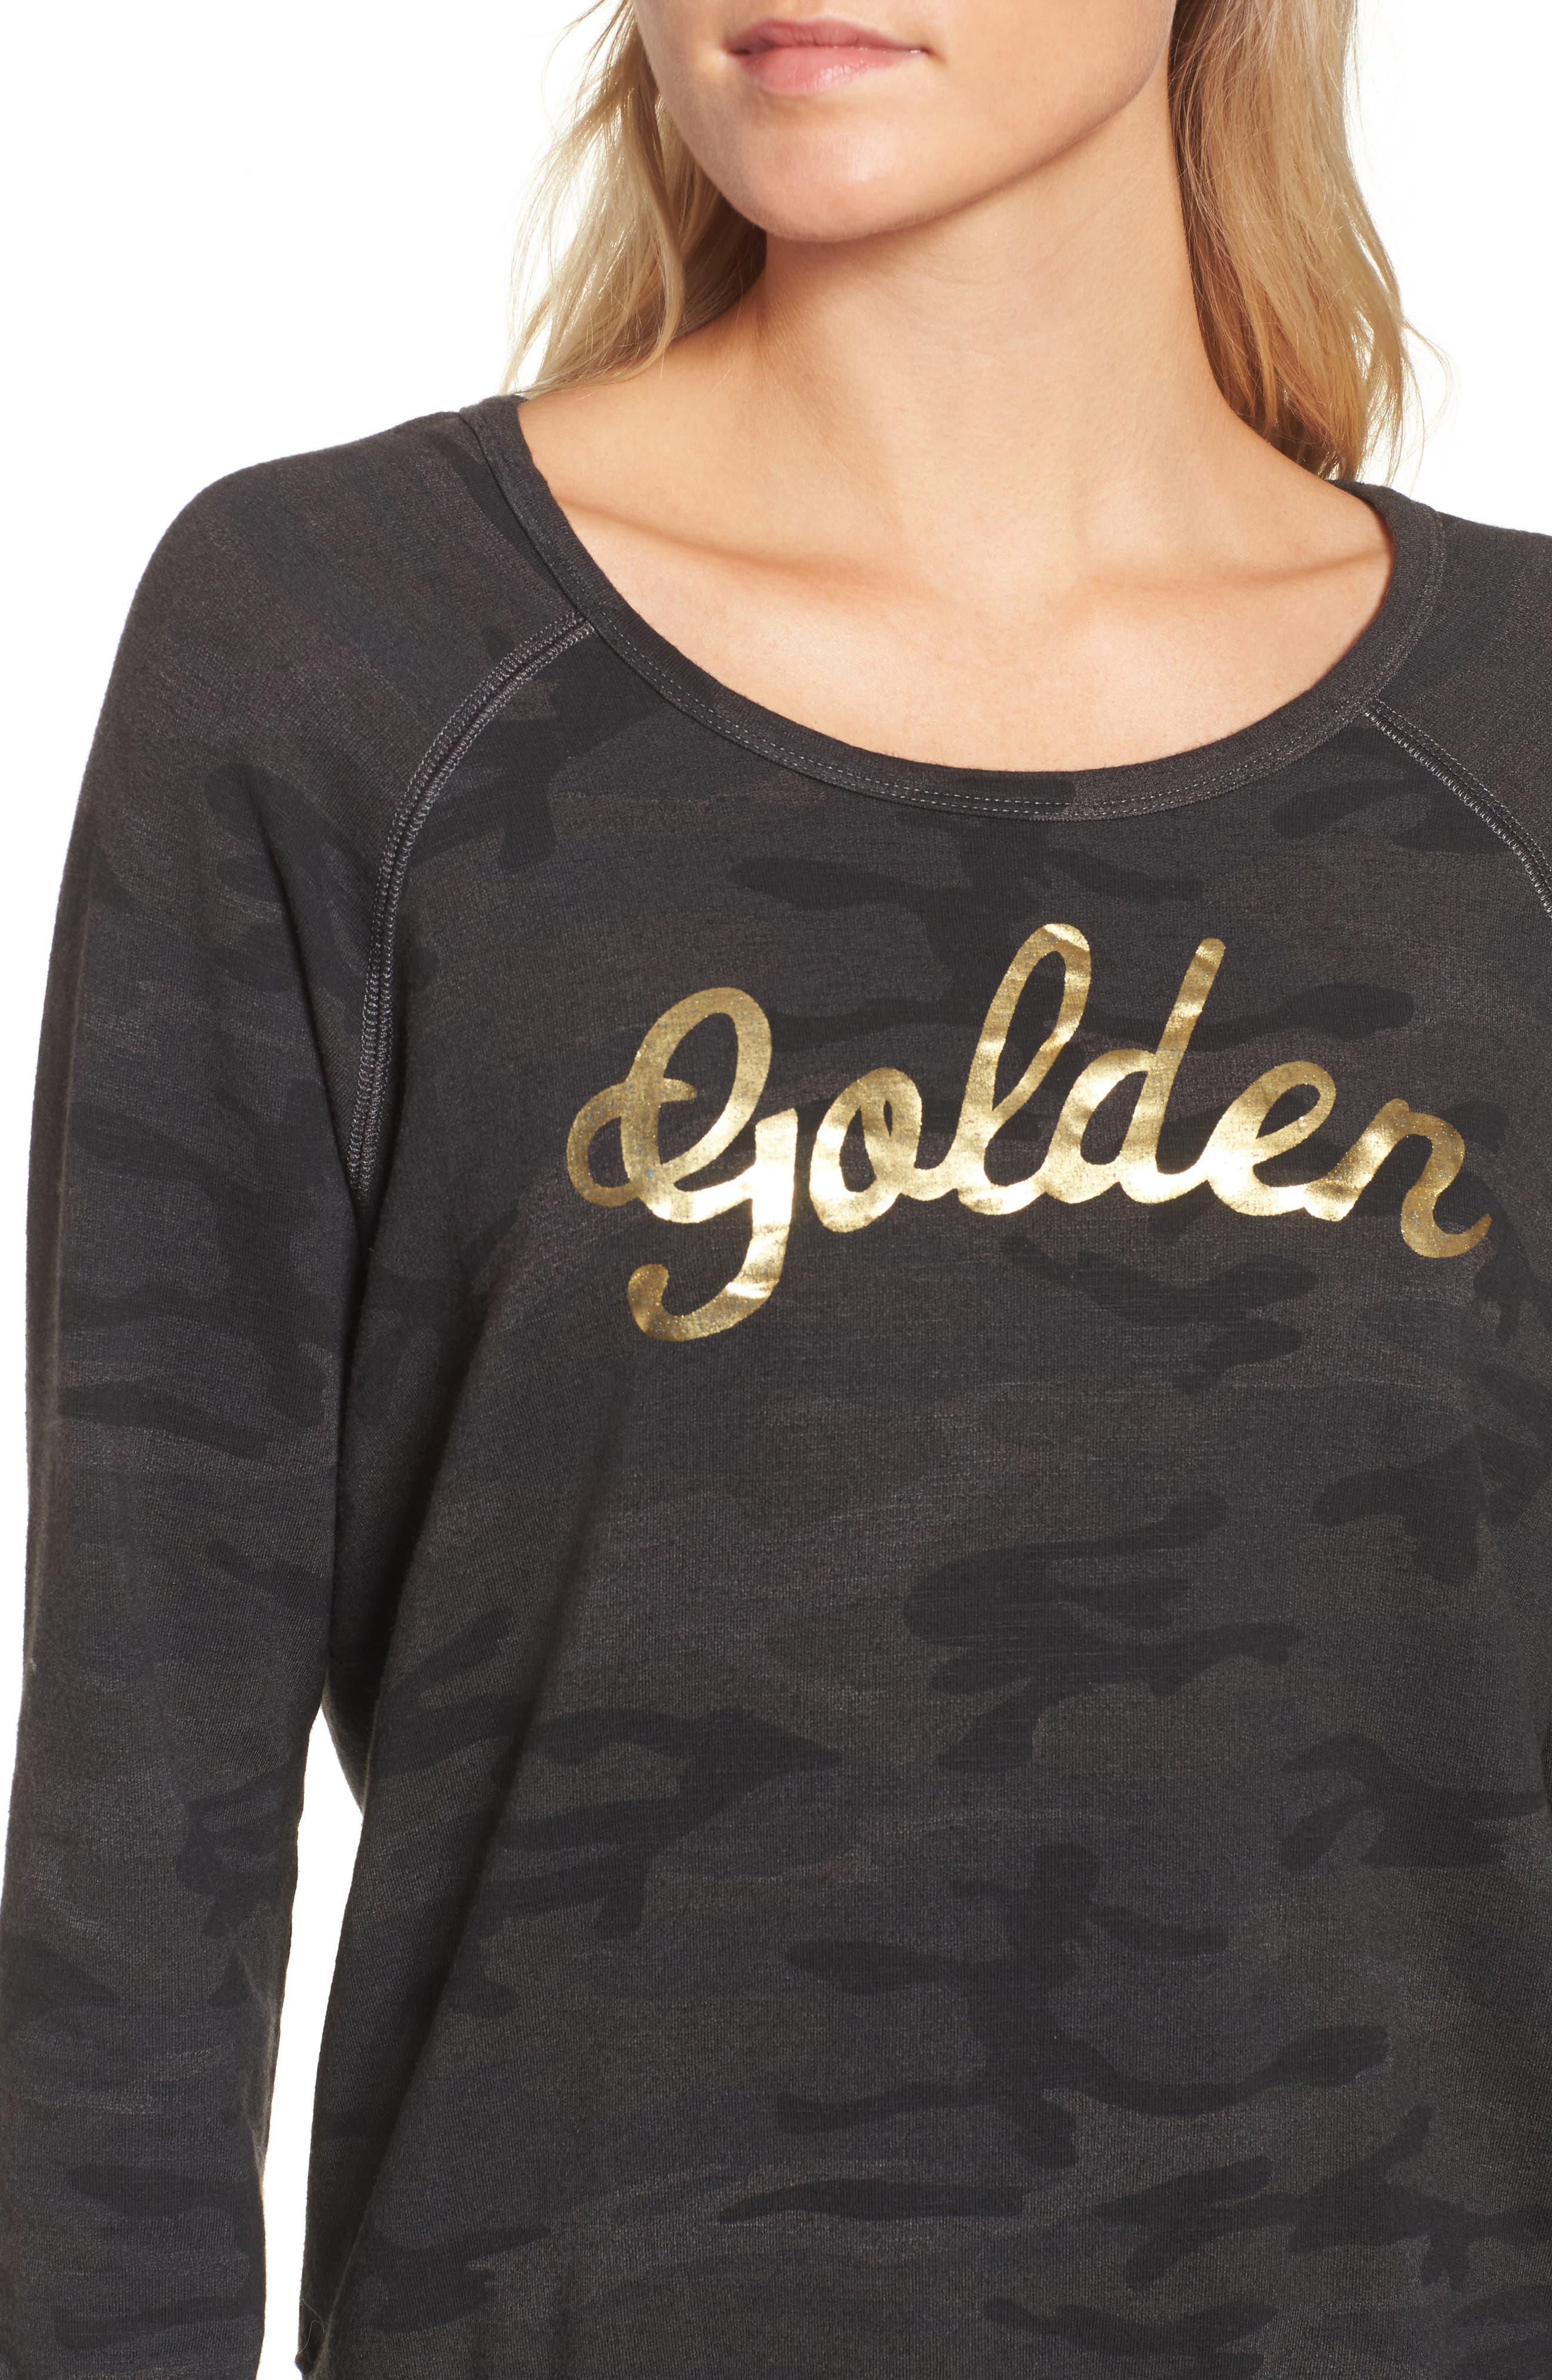 Active Golden Sweatshirt,                             Alternate thumbnail 4, color,                             020